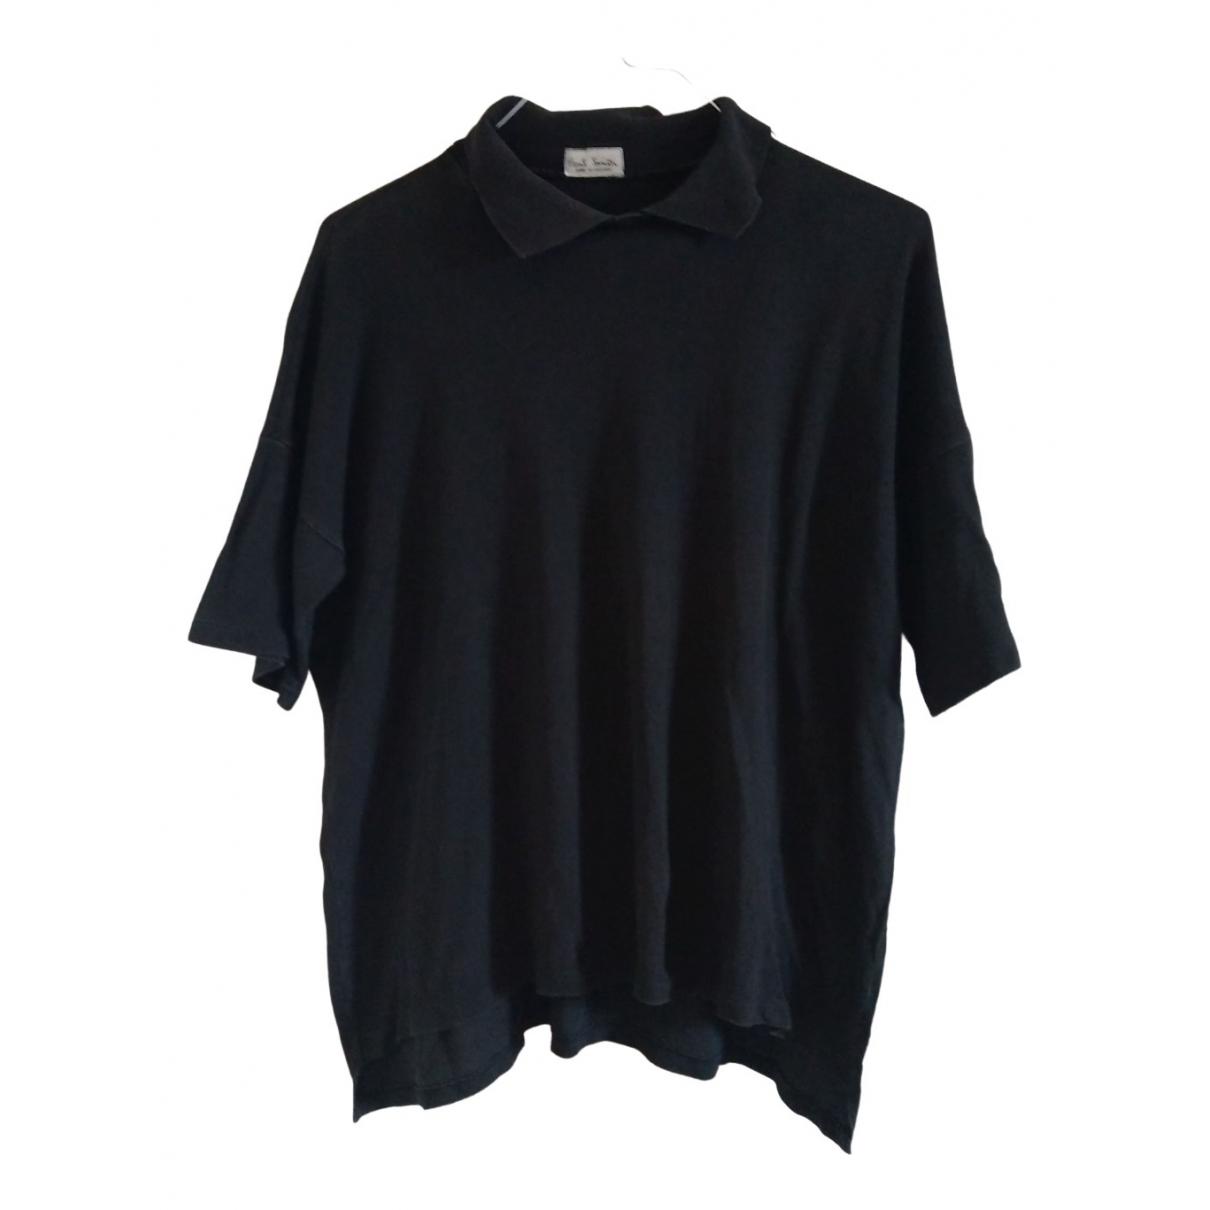 Paul Smith - Polos   pour homme en coton - noir